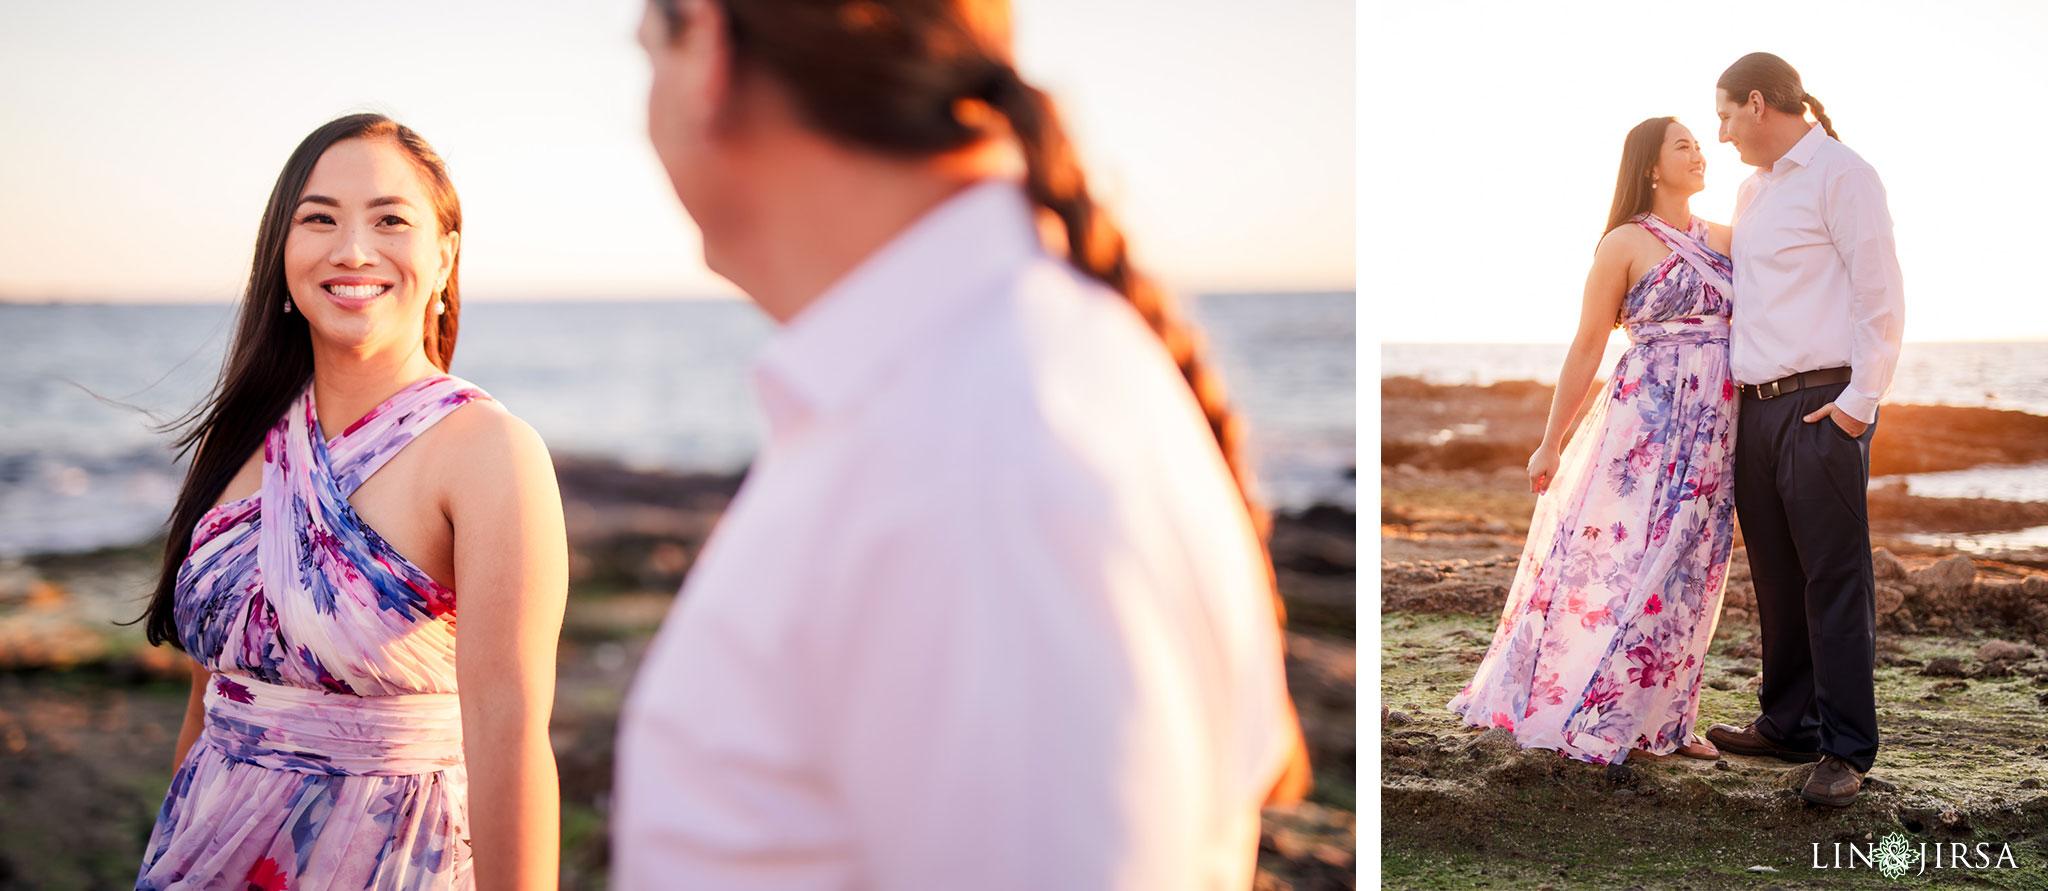 07 laguna beach sunset engagement photographer